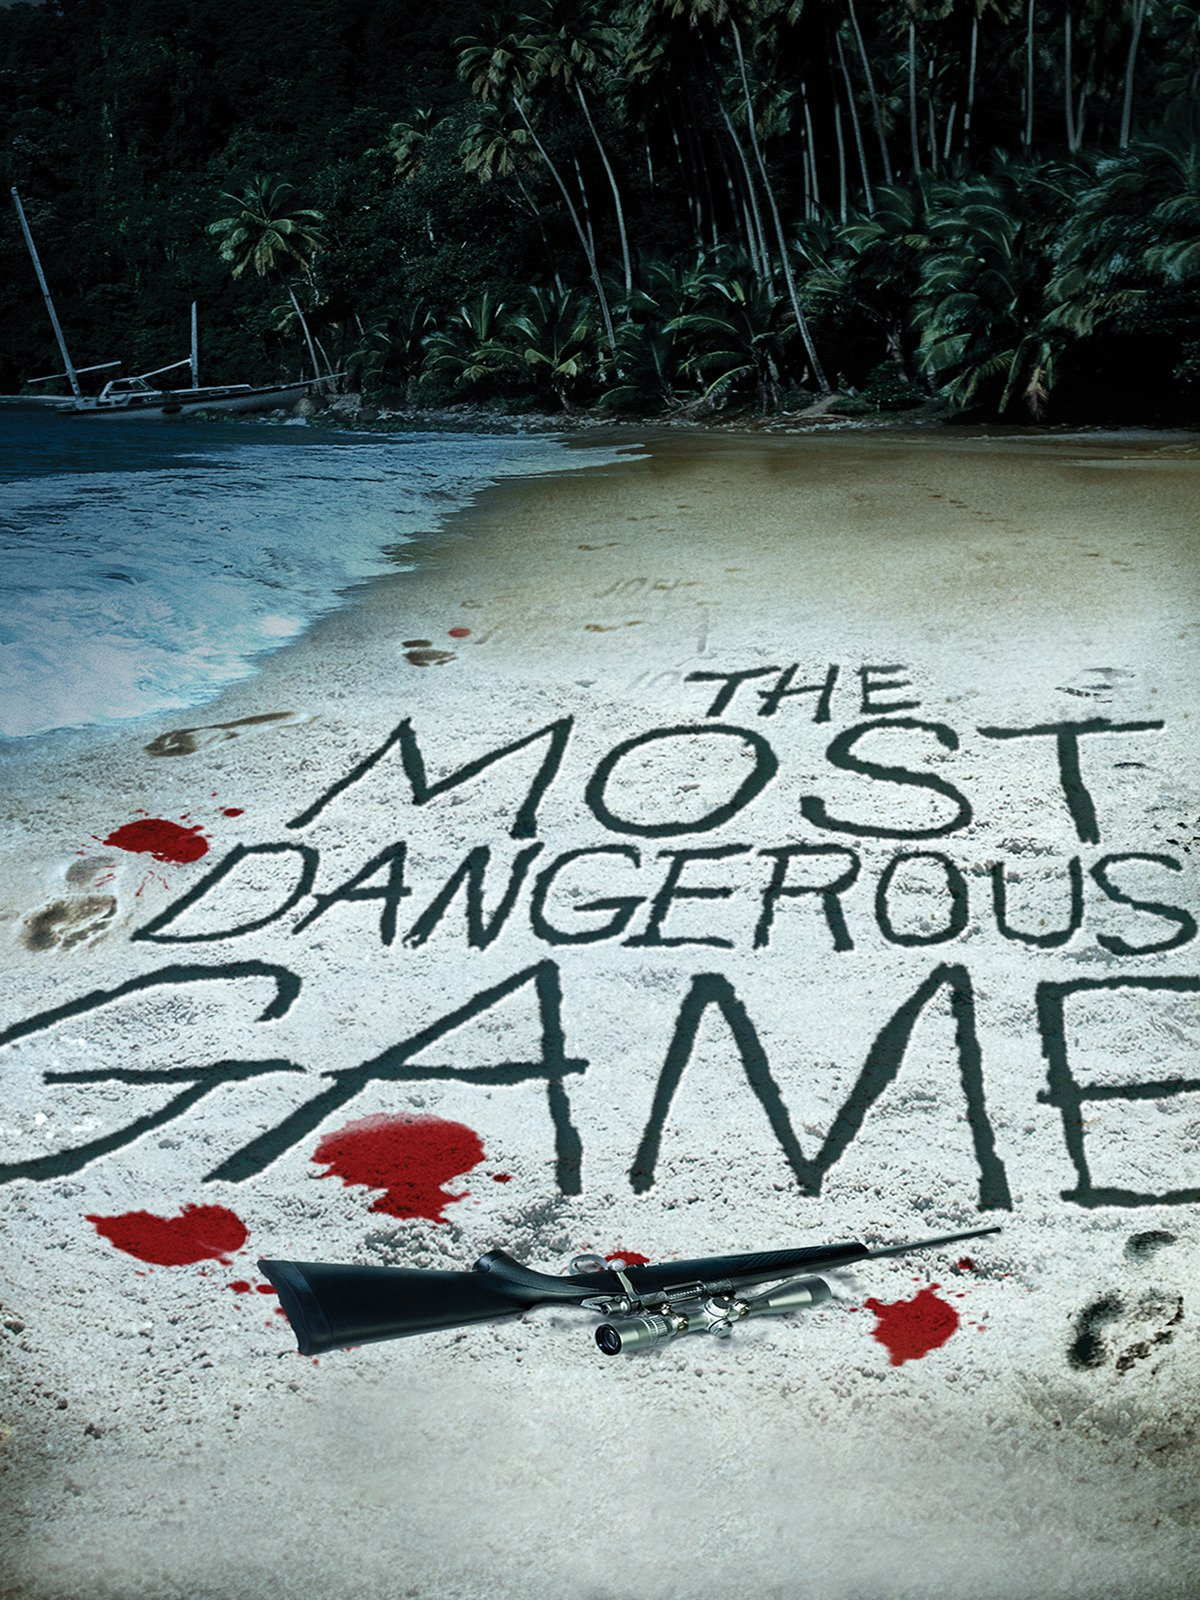 Amazon.com: The Most Dangerous Game (In Color): Joel McCrea, Fay ...